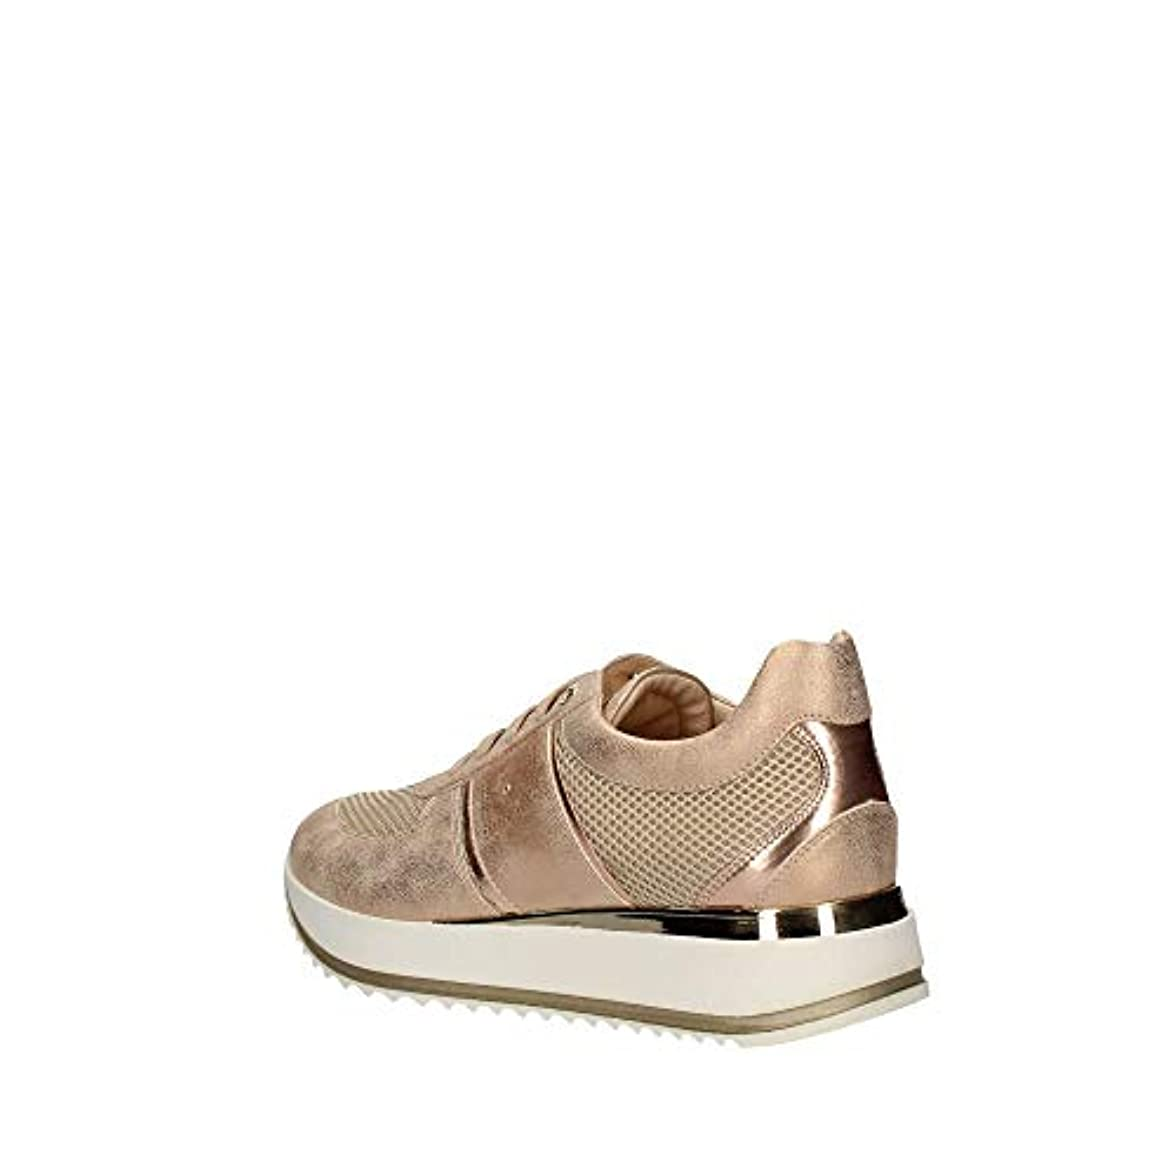 Liu-jo Girl L4a4-20358-0574 Sneakers Donna